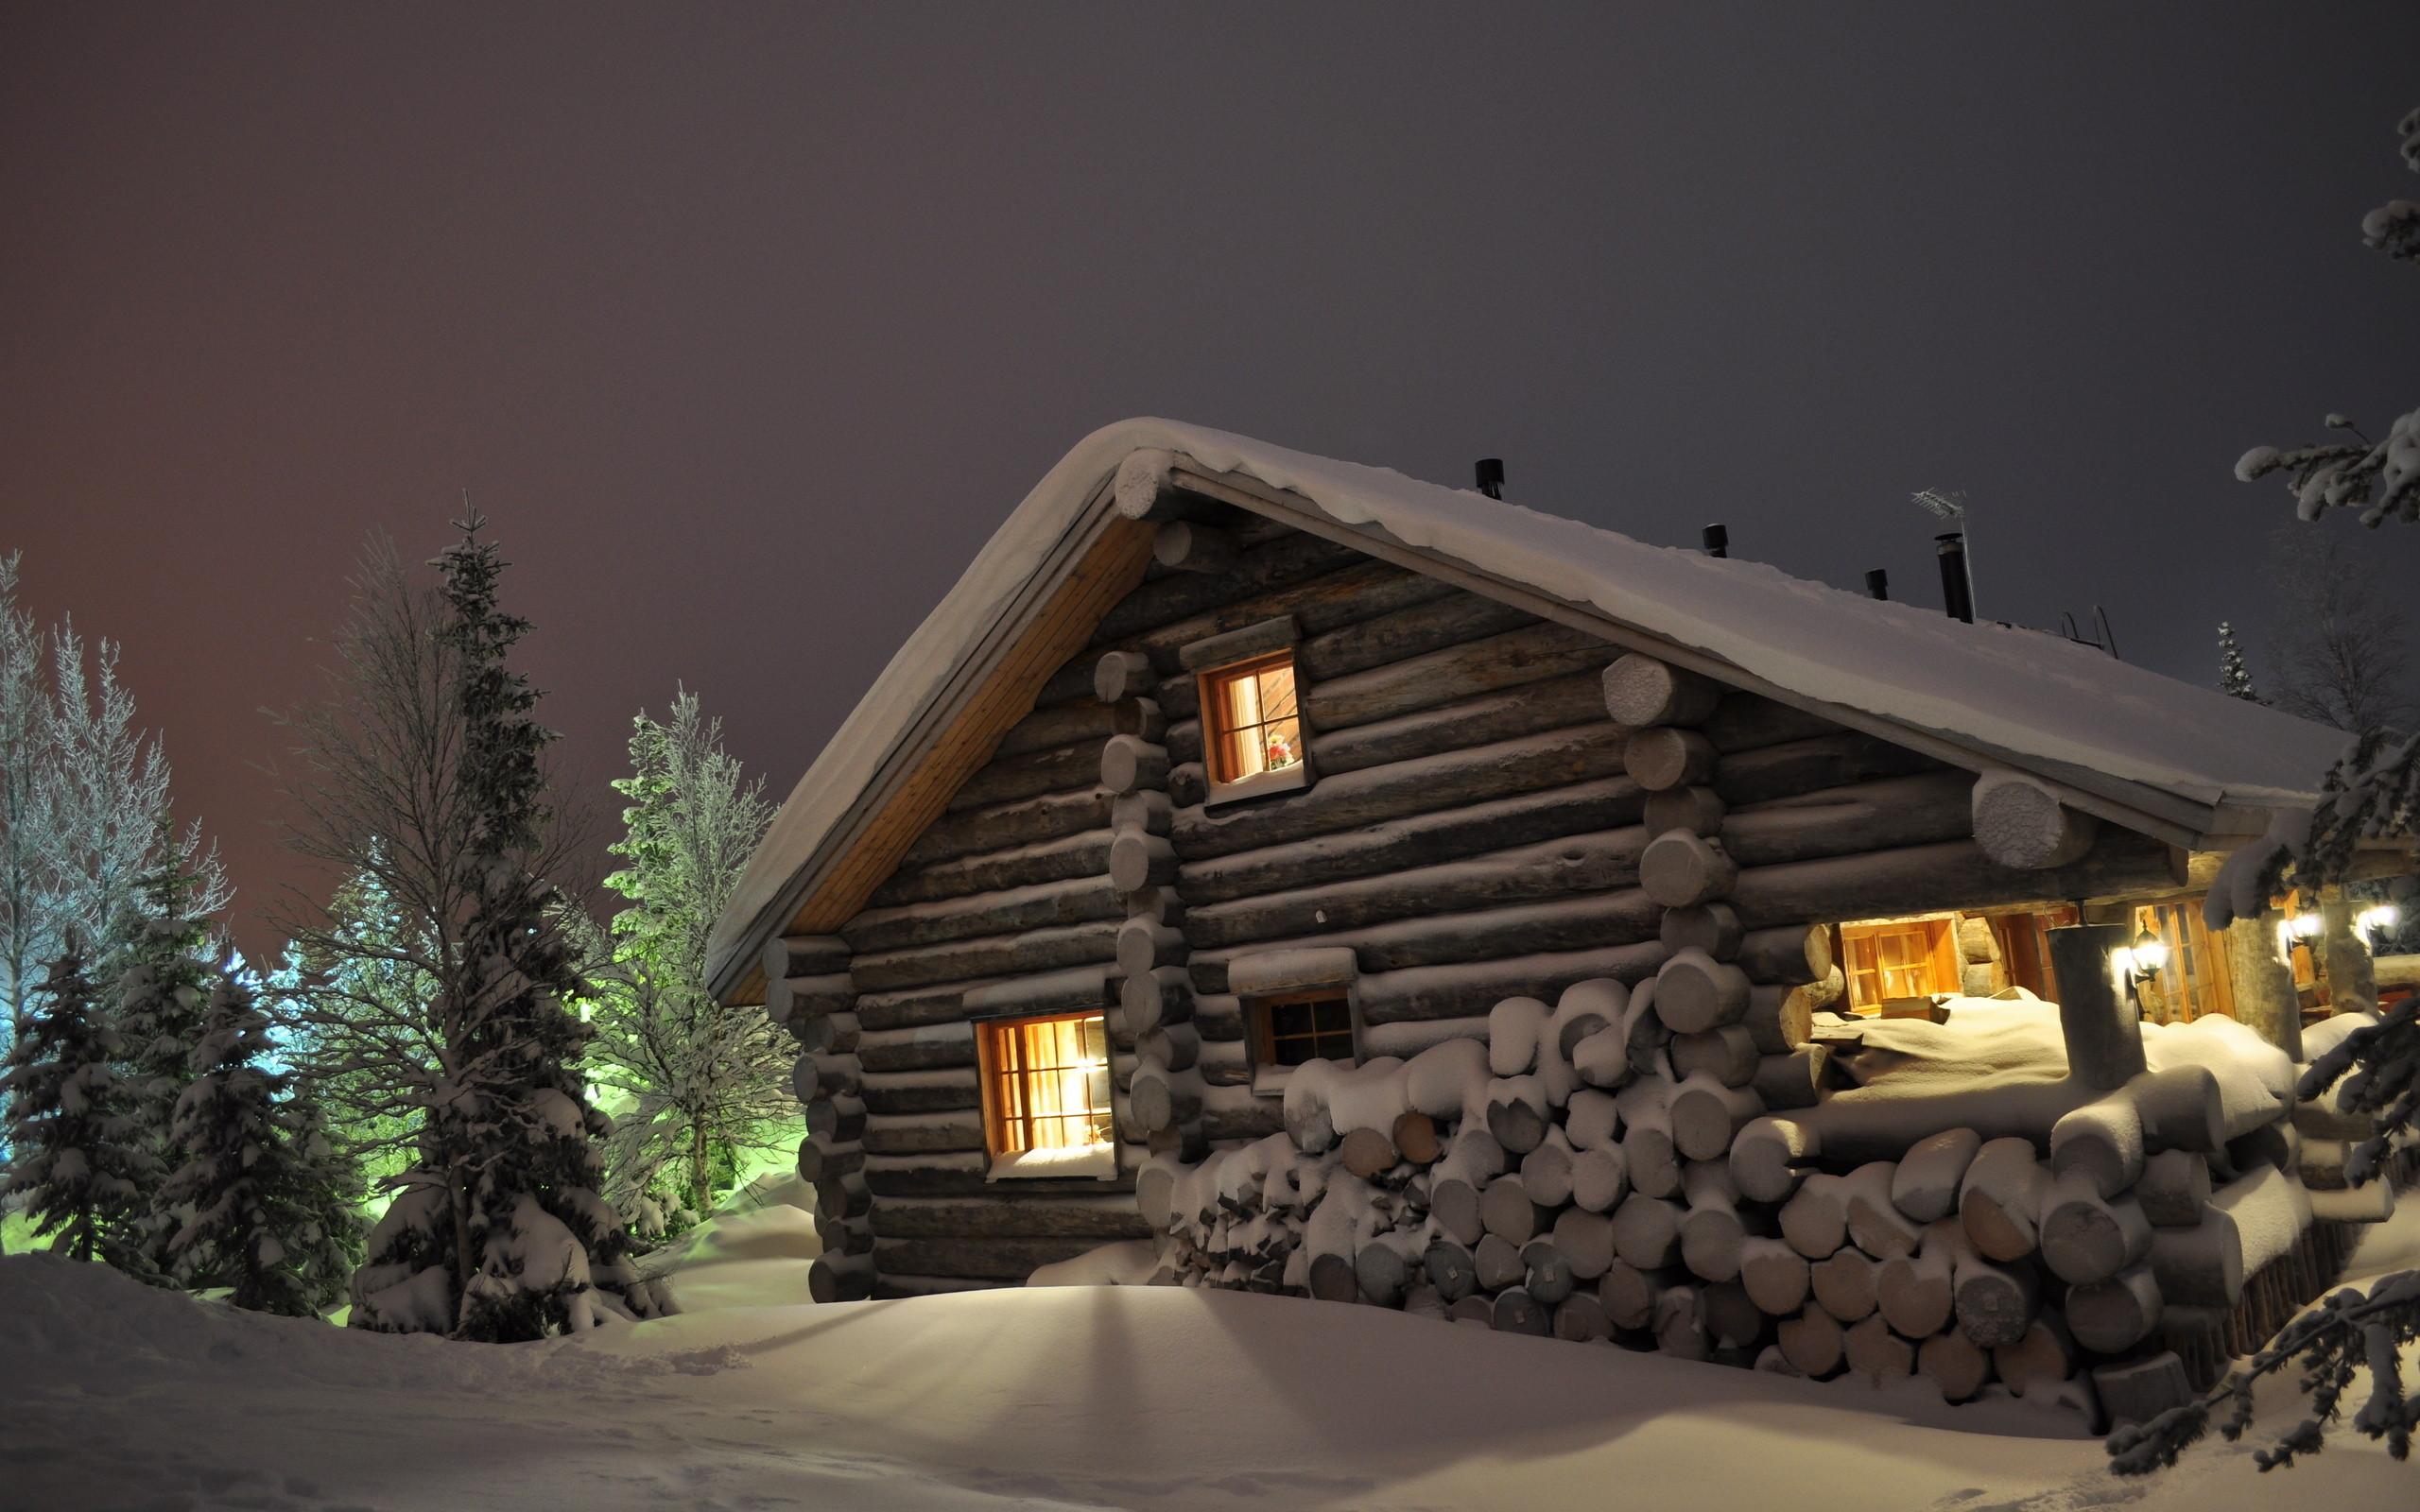 2560x1600 Wallpaper Winter Snow Drifts Log Cabin Wood Night Eating